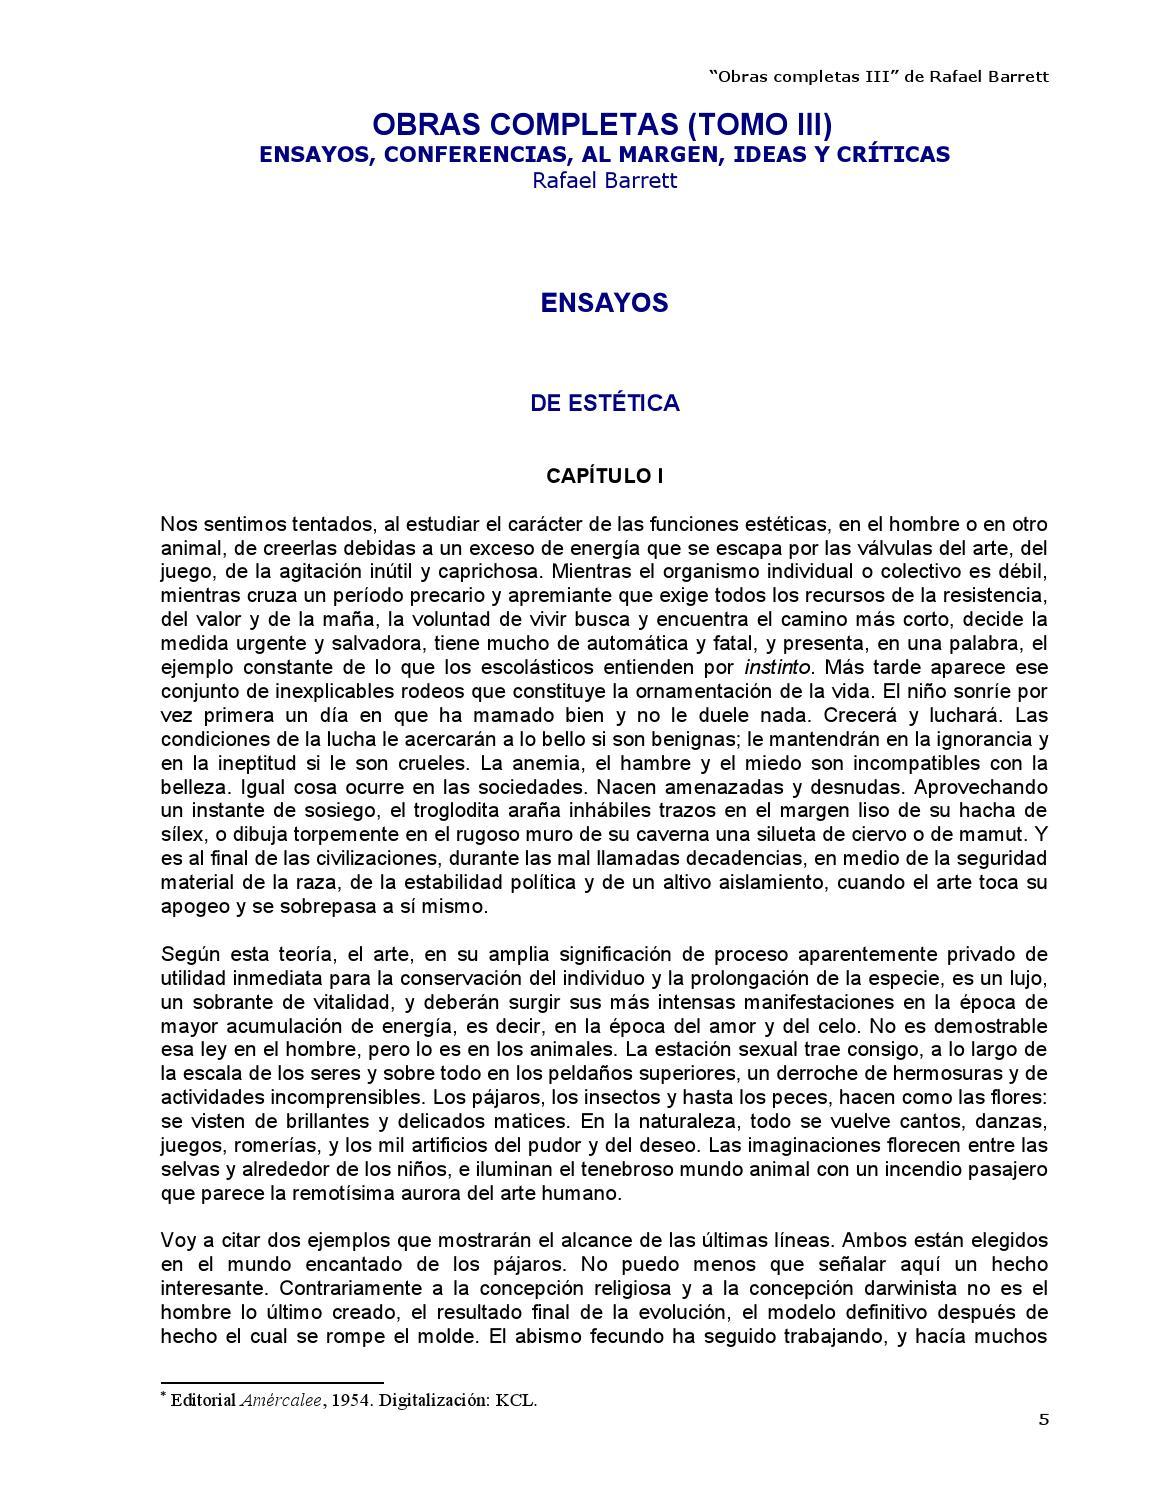 Obras completas III - Rafael Barrett by Kclibertaria - issuu